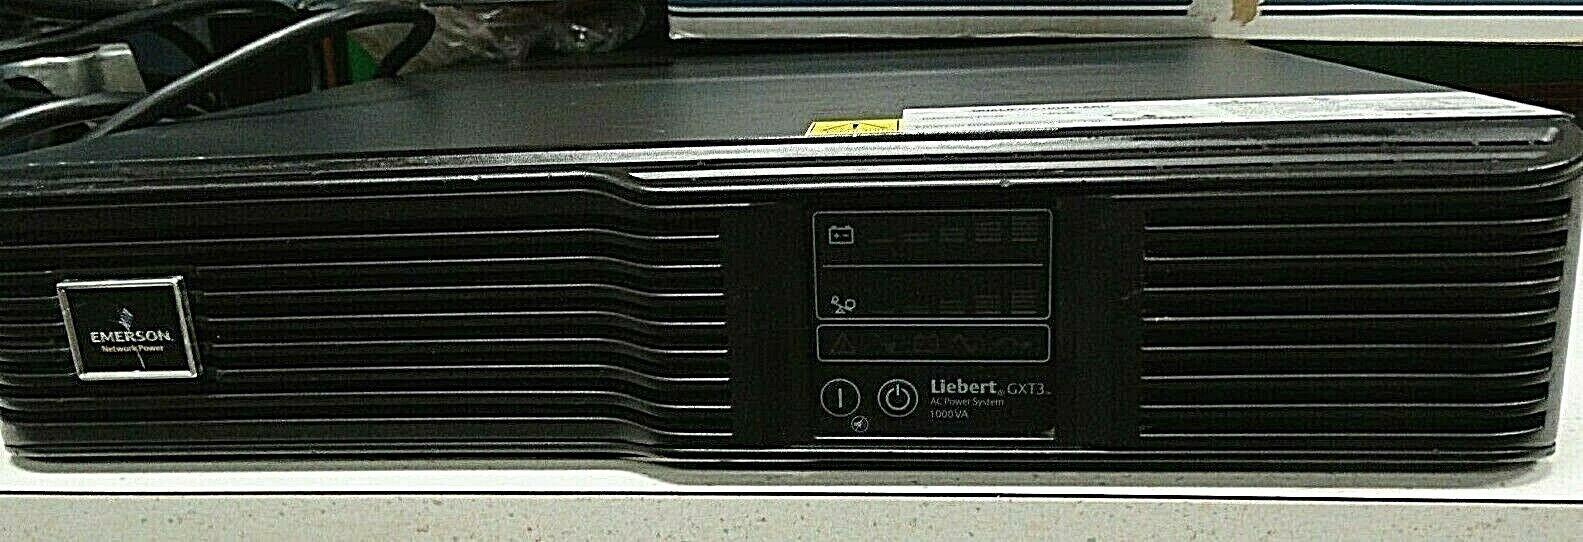 Compatible Replacement Battery Kit GXT3-288RTBKIT Emerson-Liebert GXT3 288V Tray